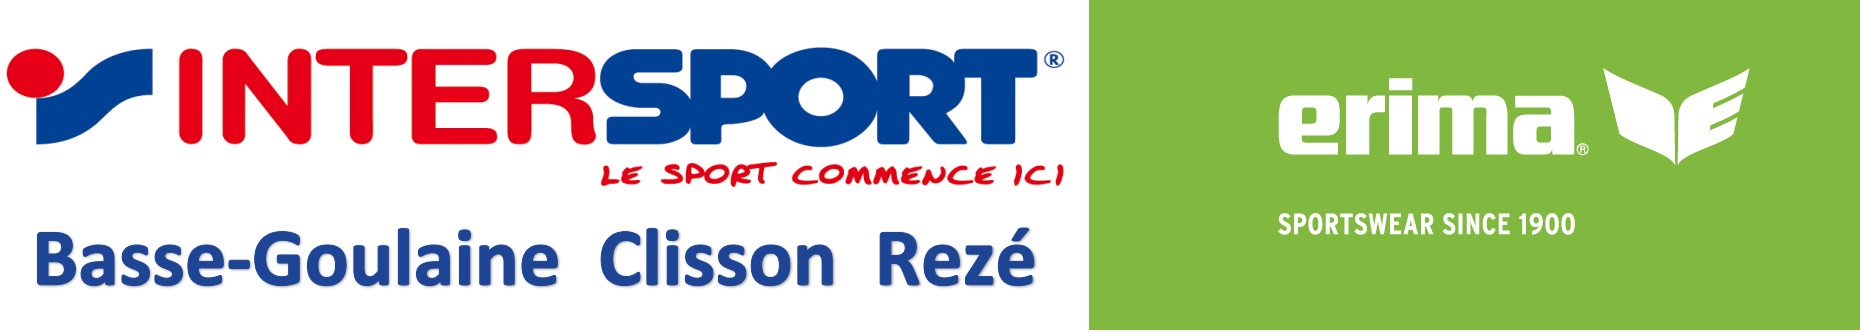 logo_intersport_erima